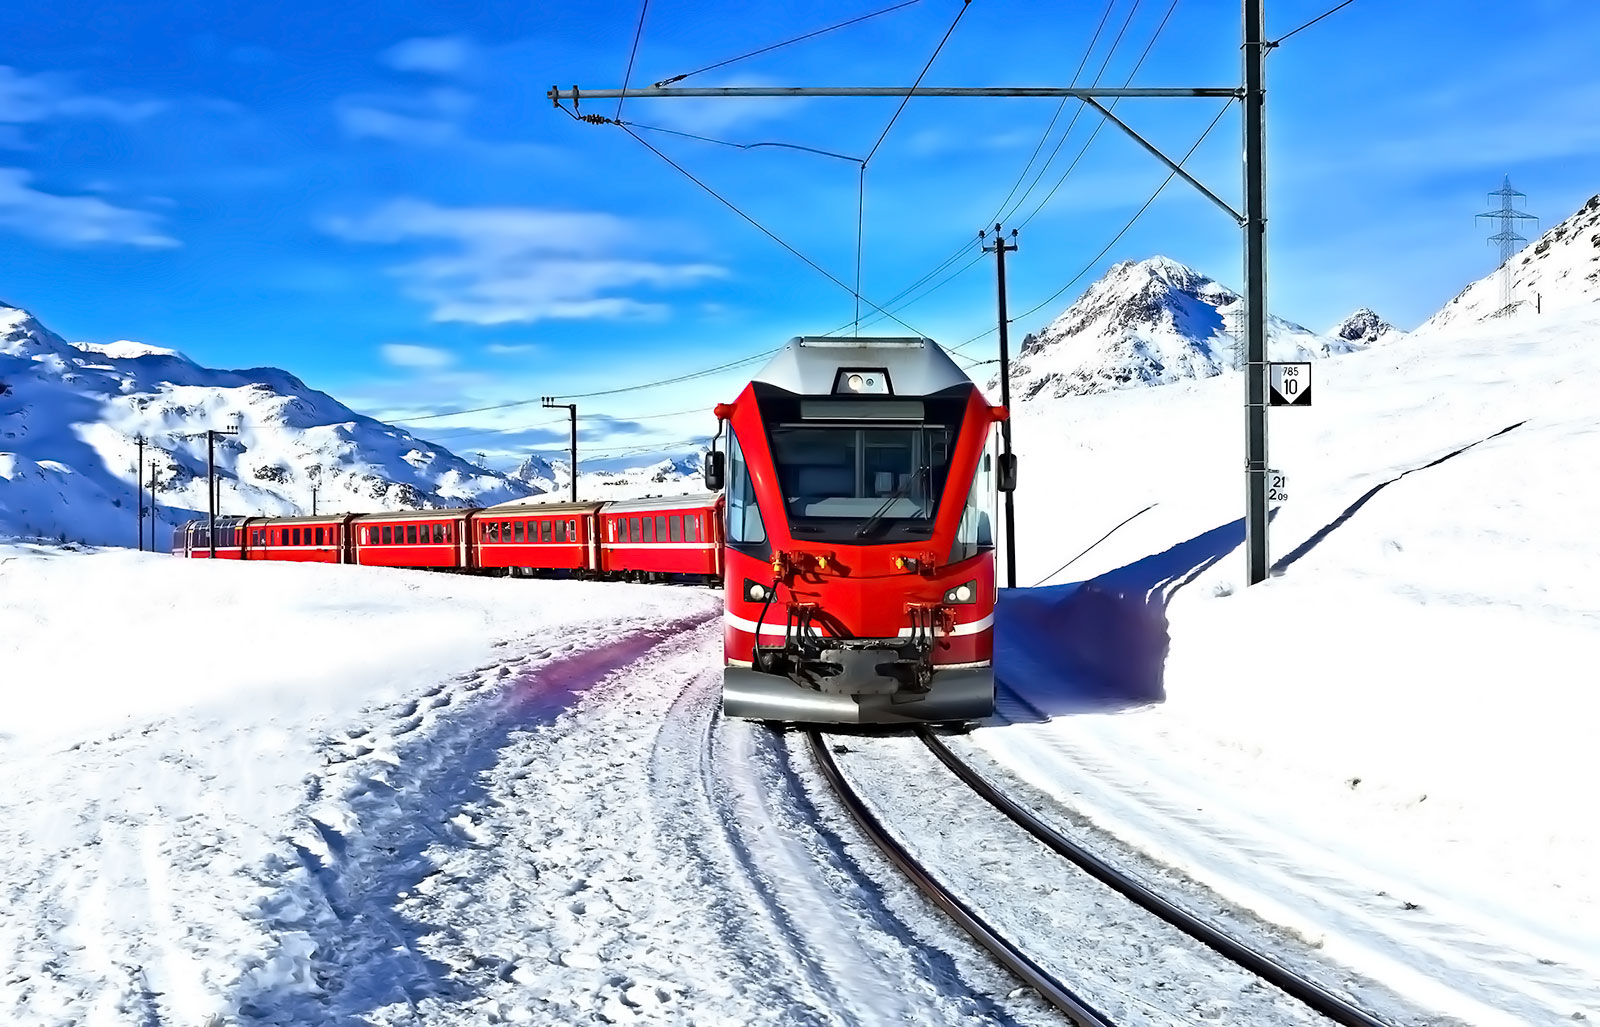 Winter Bernina Express